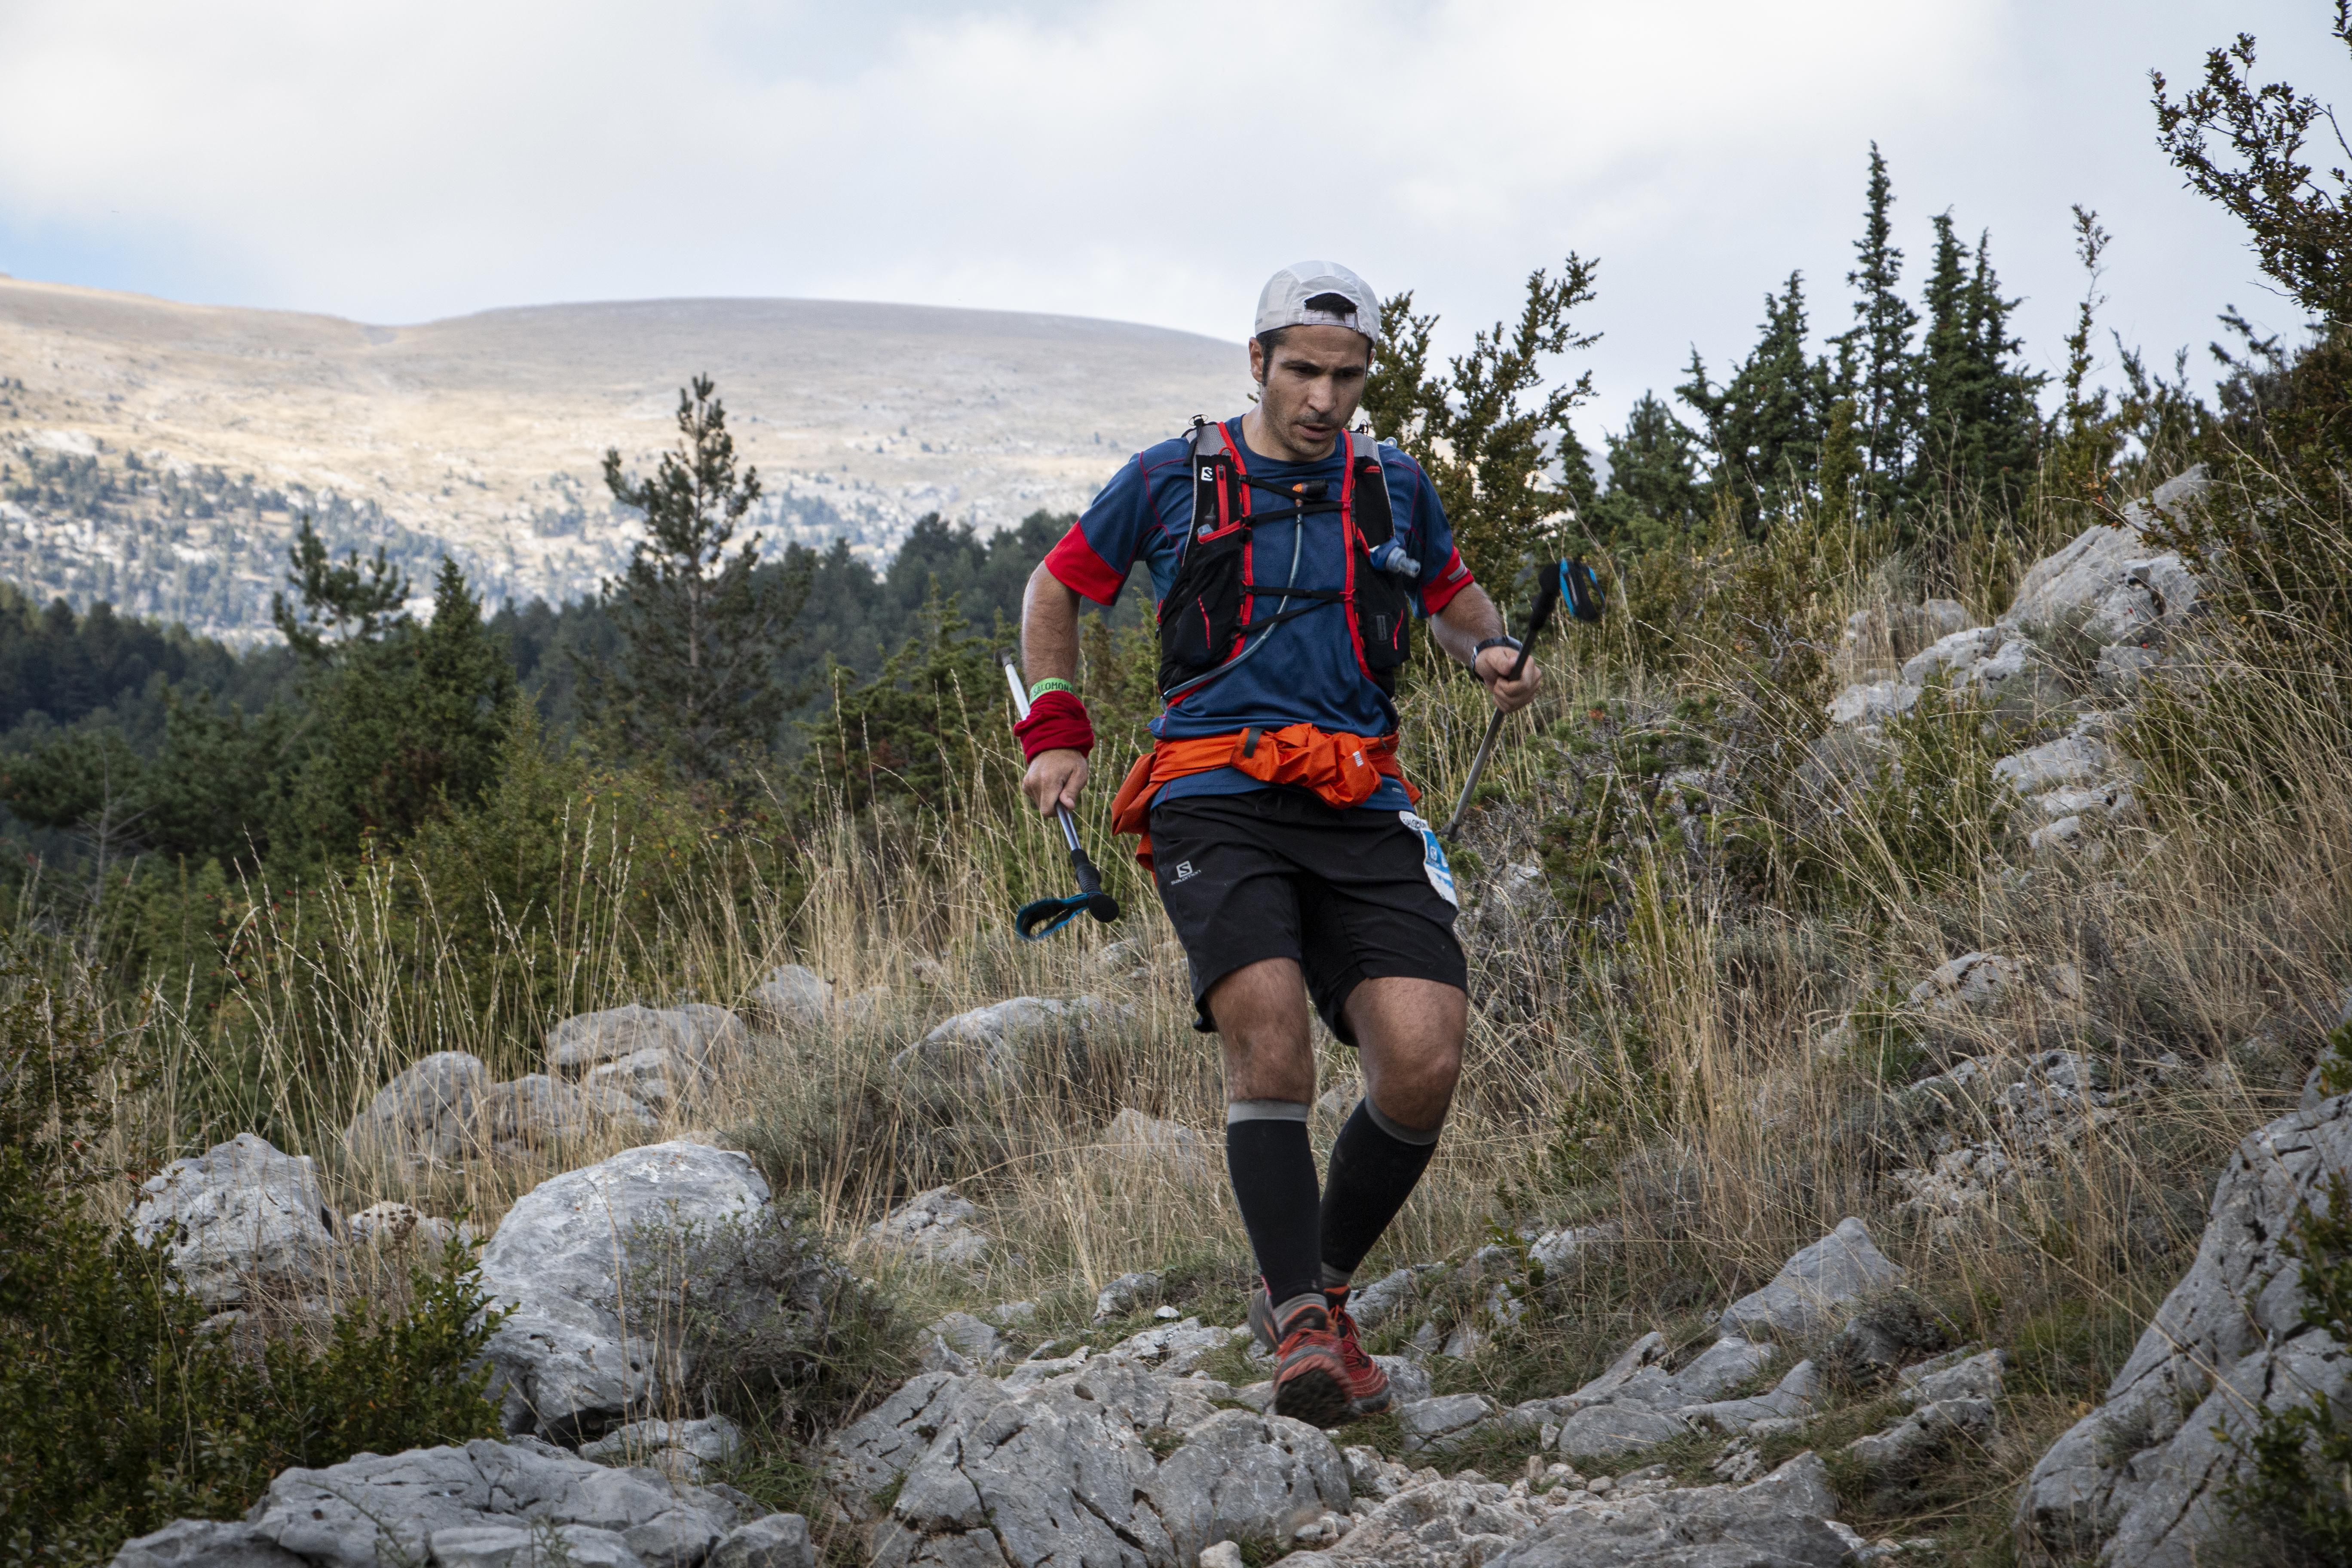 L'Ultra Pirineu 2021 té una distància de 100km. FOTO: Anna E. Puig